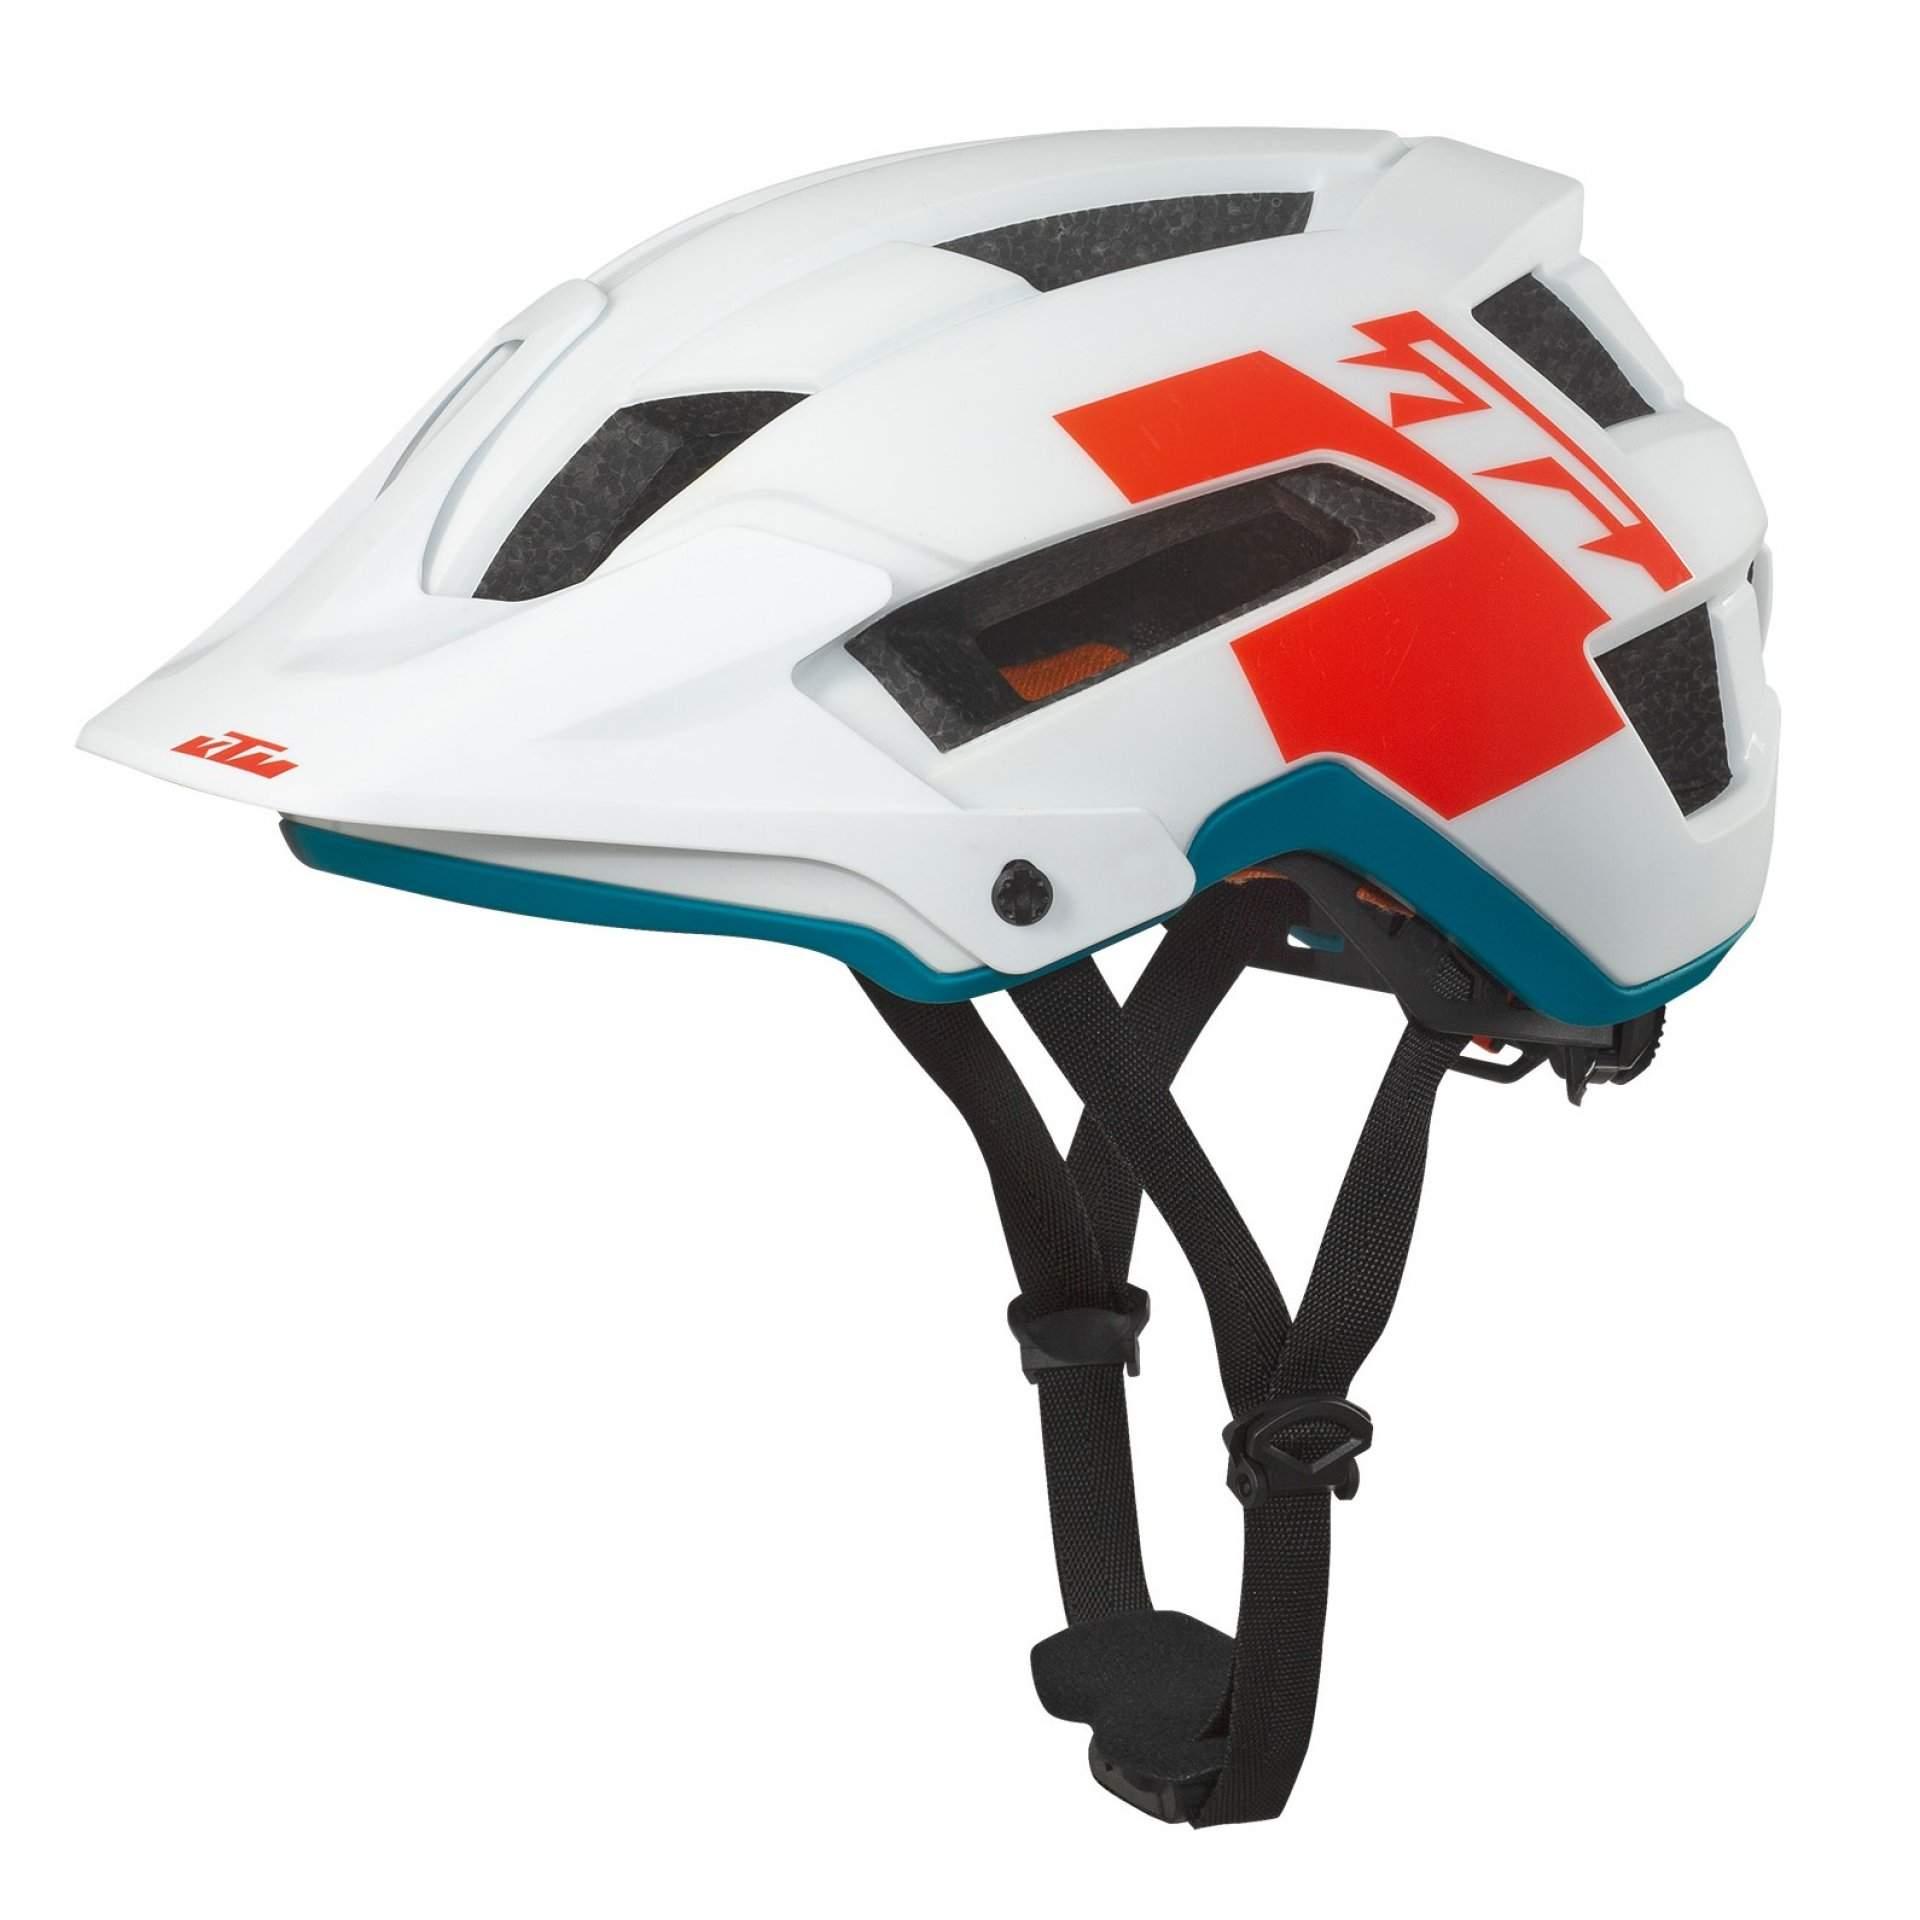 KASK ROWEROWY KTM FACTORY ENDURO 6731641 WHITE MATT|FIRE ORANGE